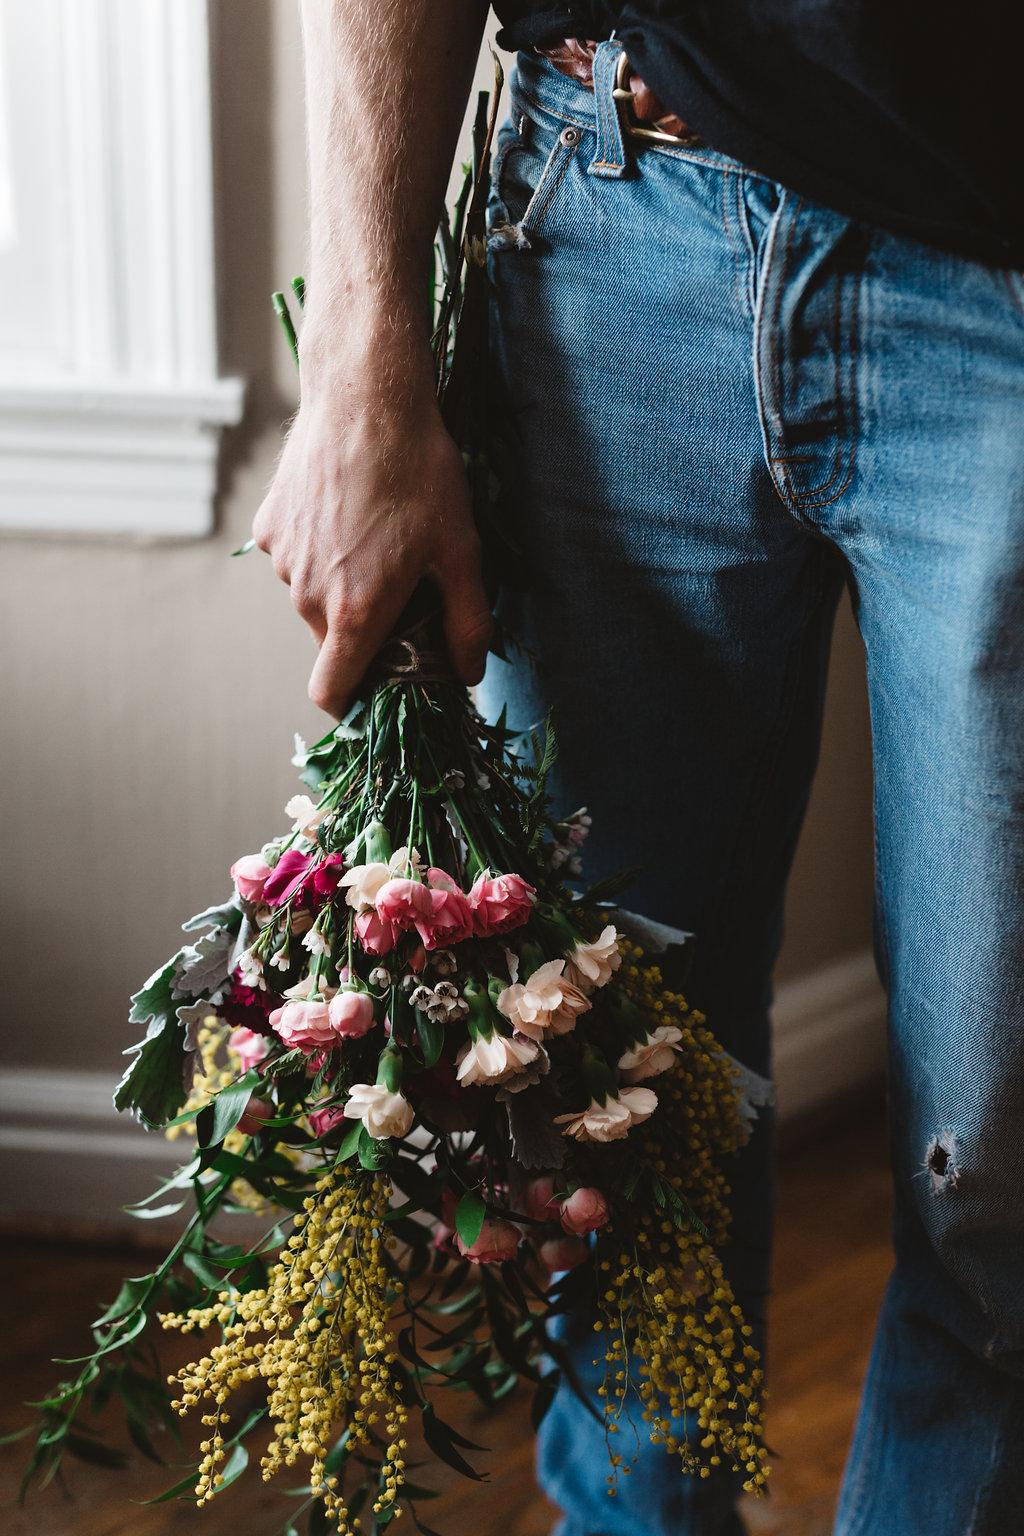 ValentinesDayCreative29.jpg